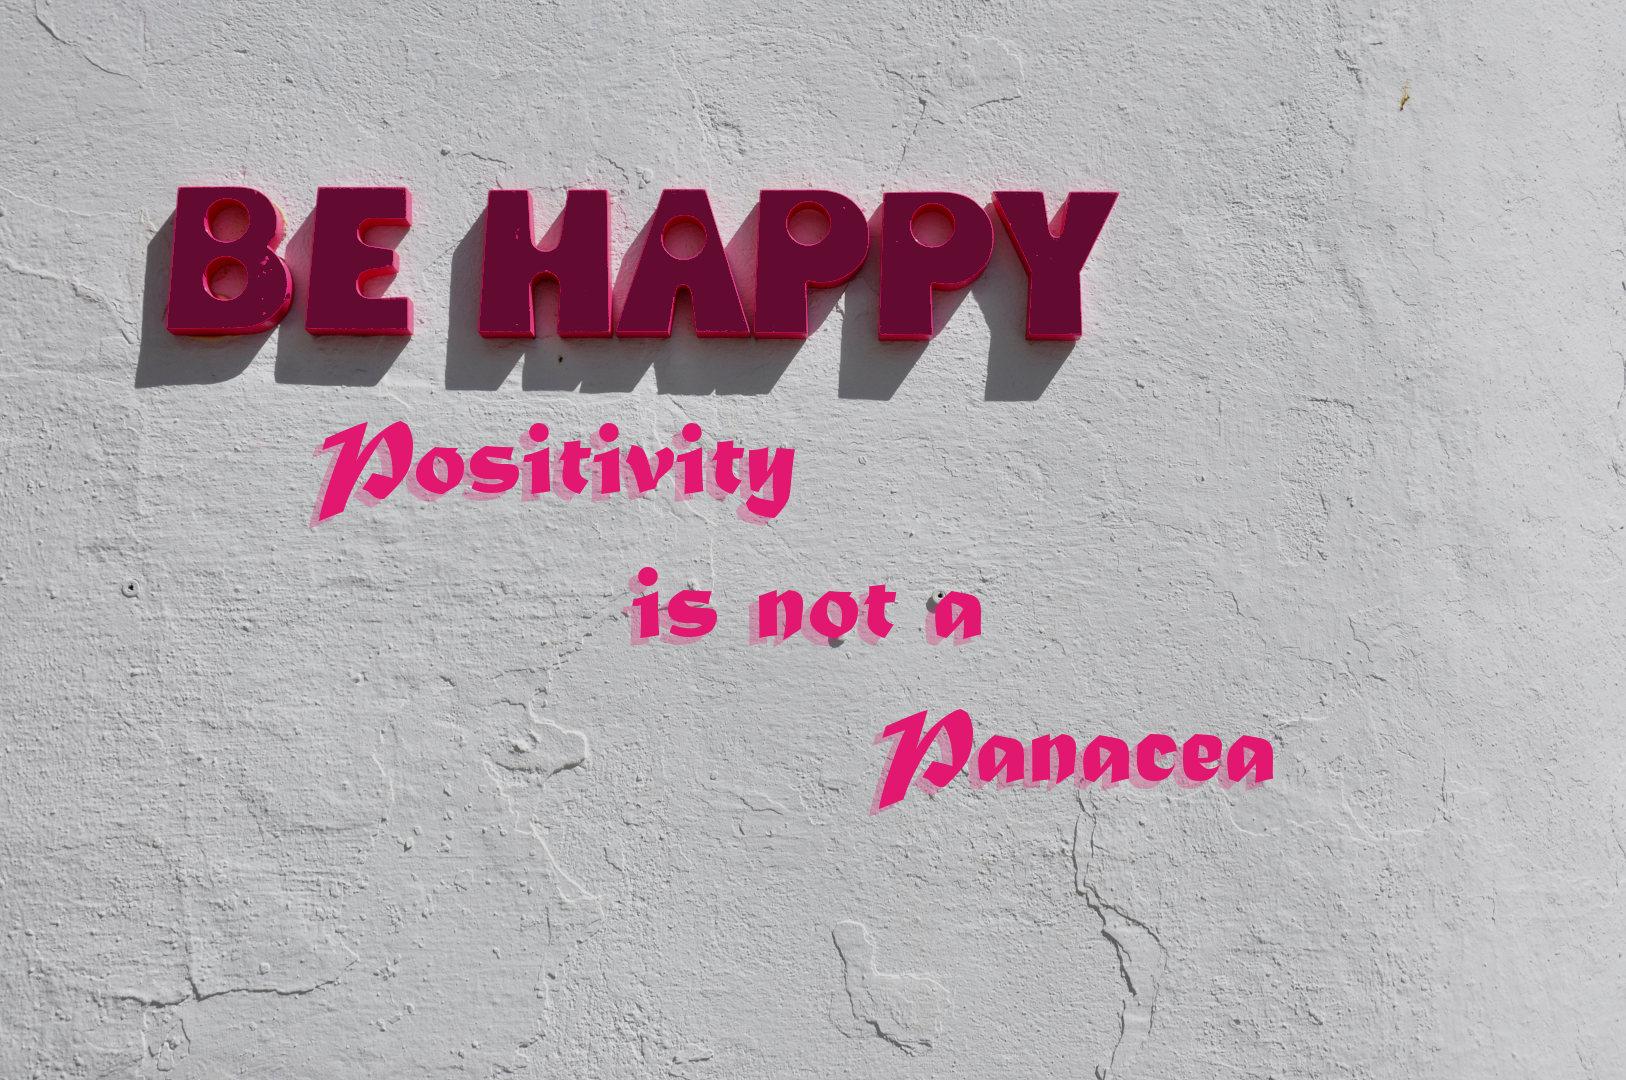 Positivity is not a Panacea